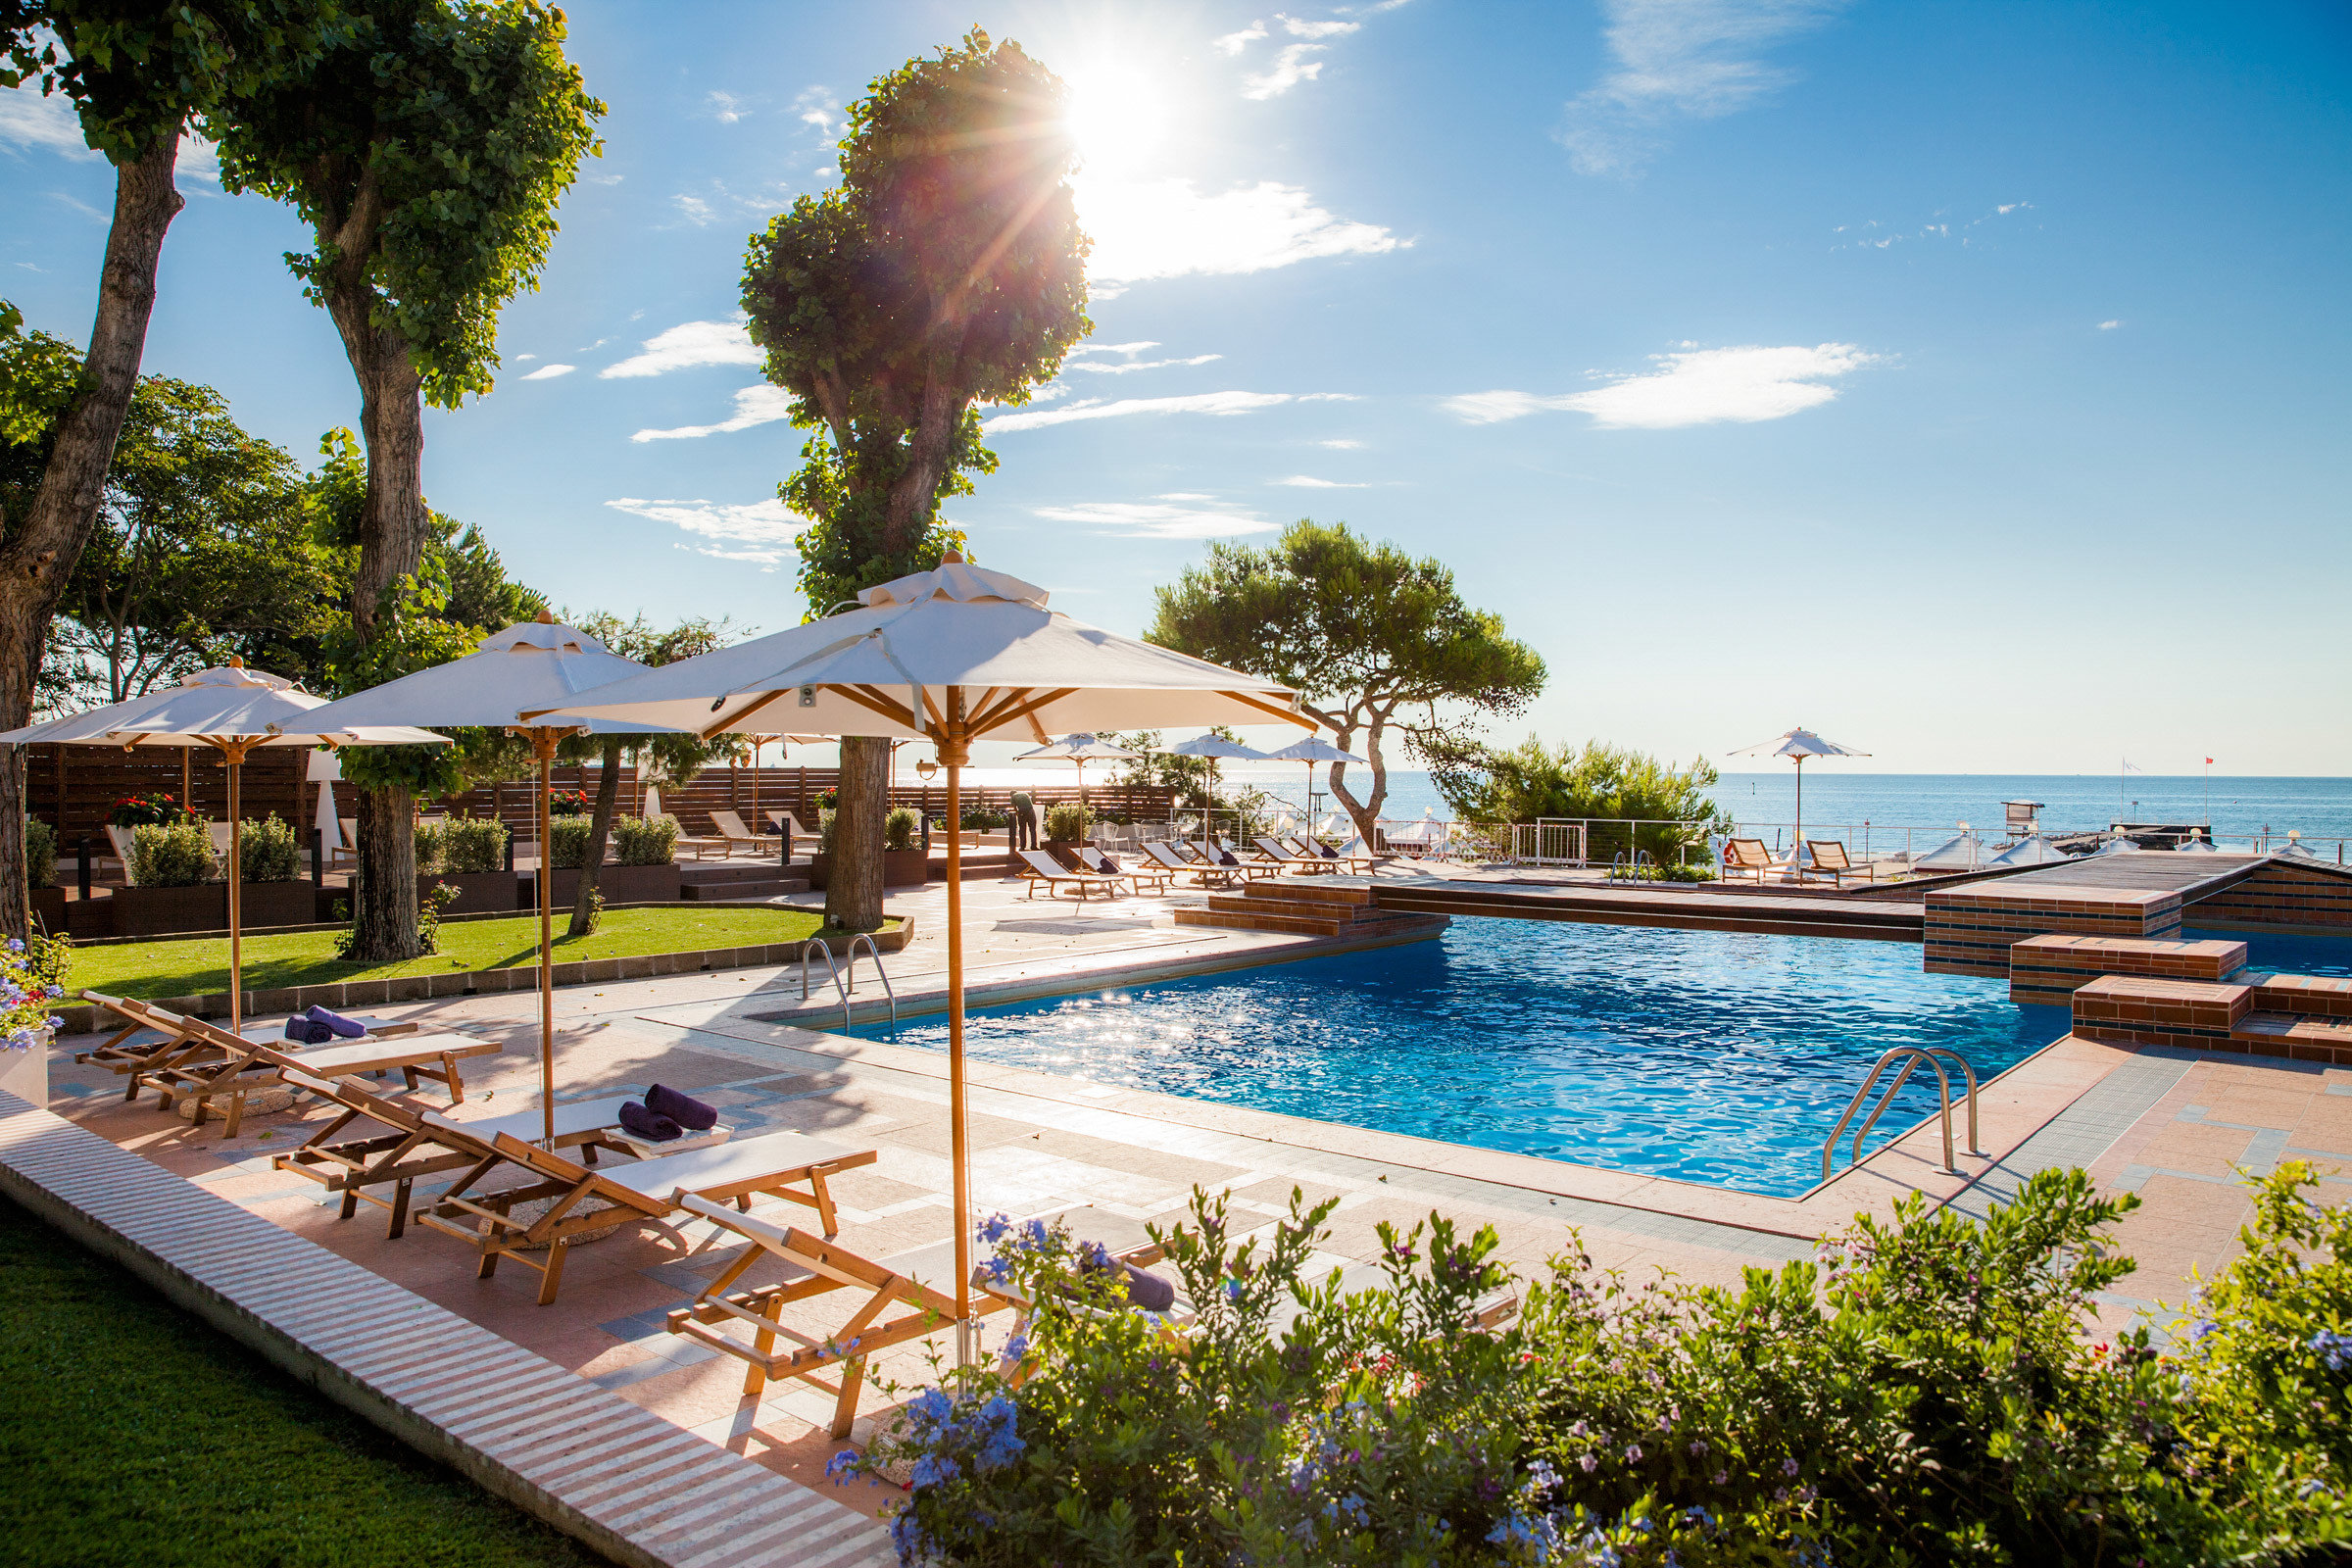 tree sky water swimming pool leisure property Resort Villa backyard condominium mansion shore Deck